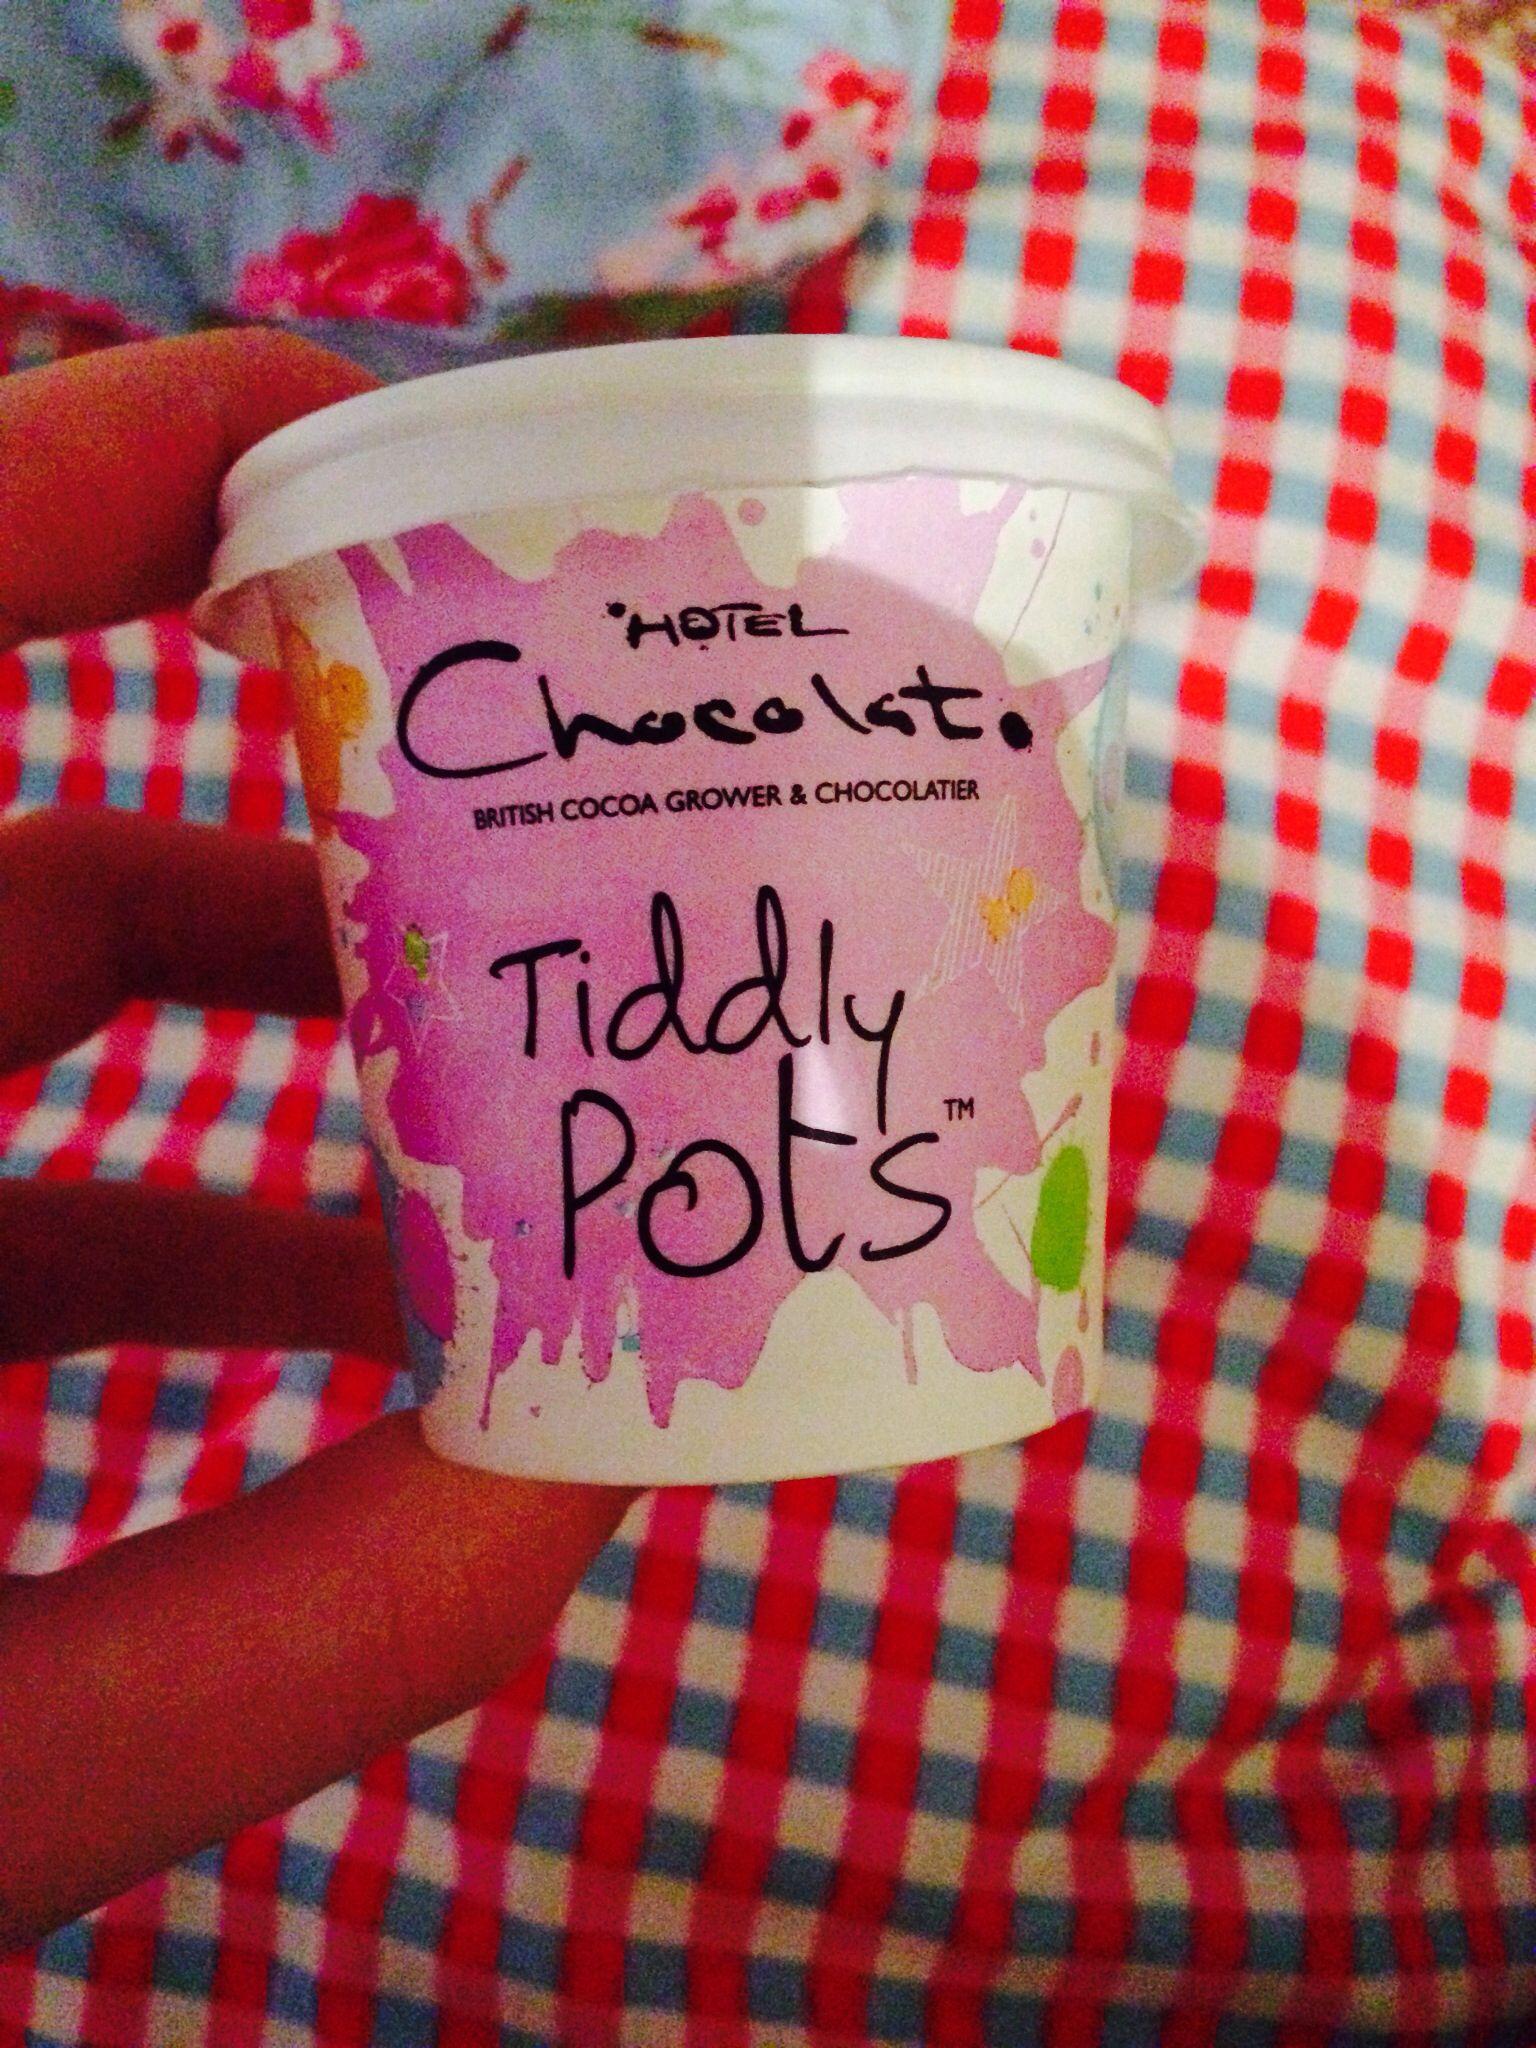 Tiddly pots #hotelchocolat